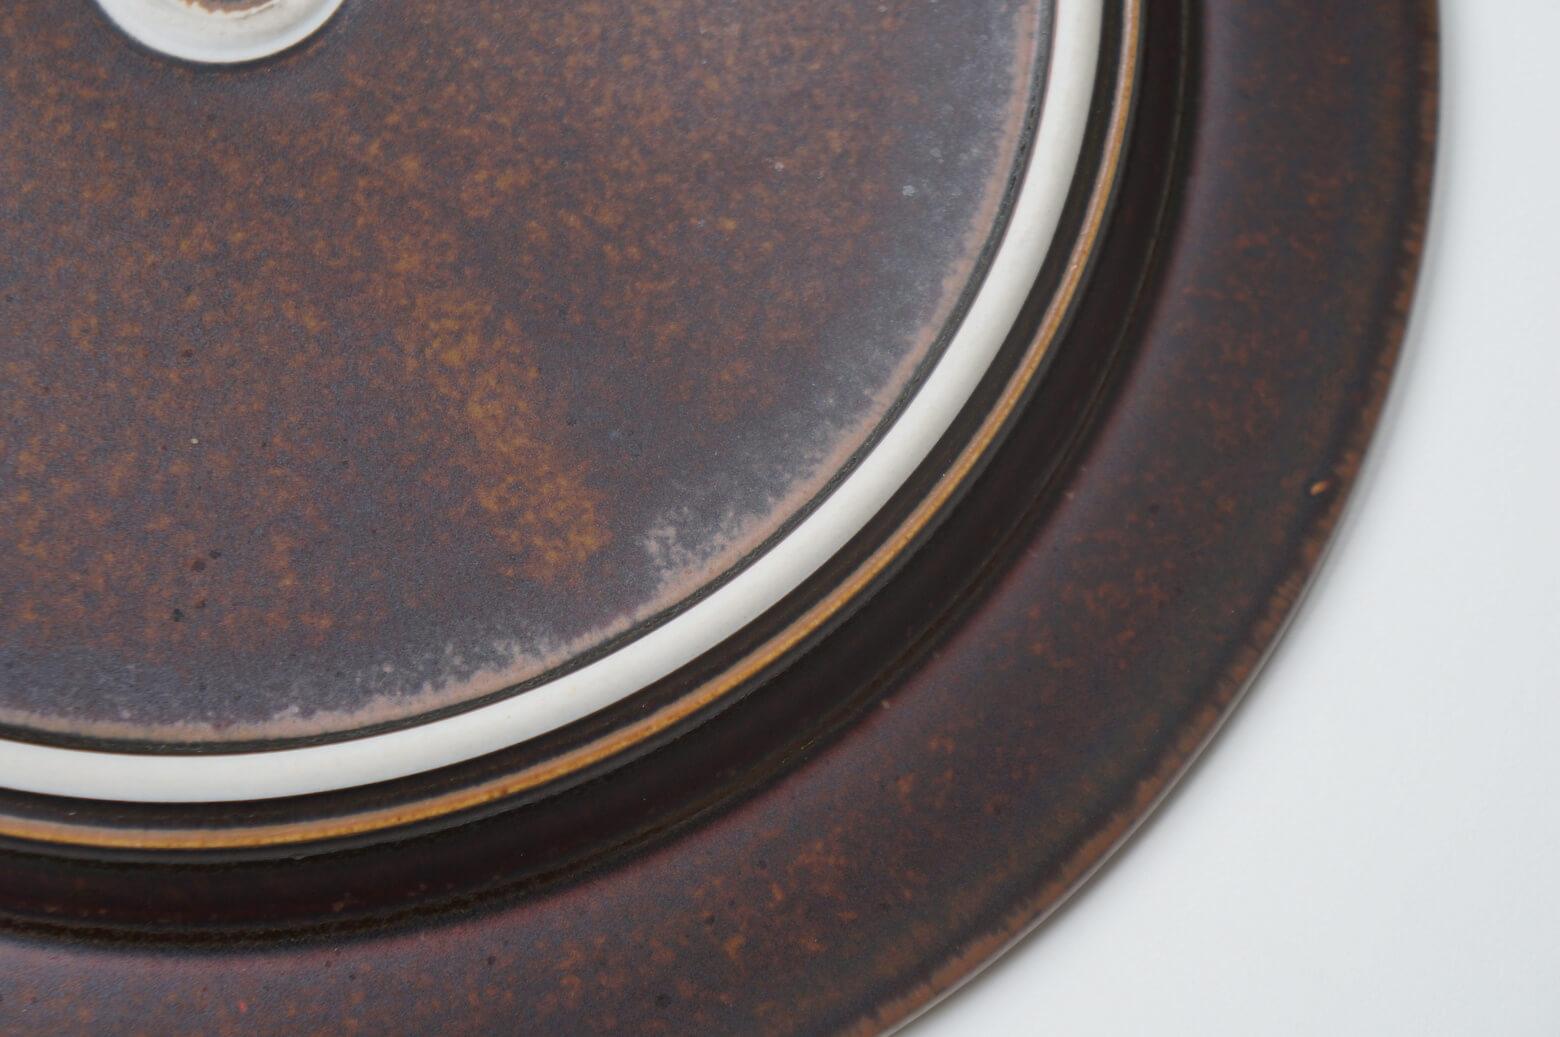 ARABIA Ruska Dinner Plate 25.5cm/アラビア ルスカ ディナープレート 25.5cm 1